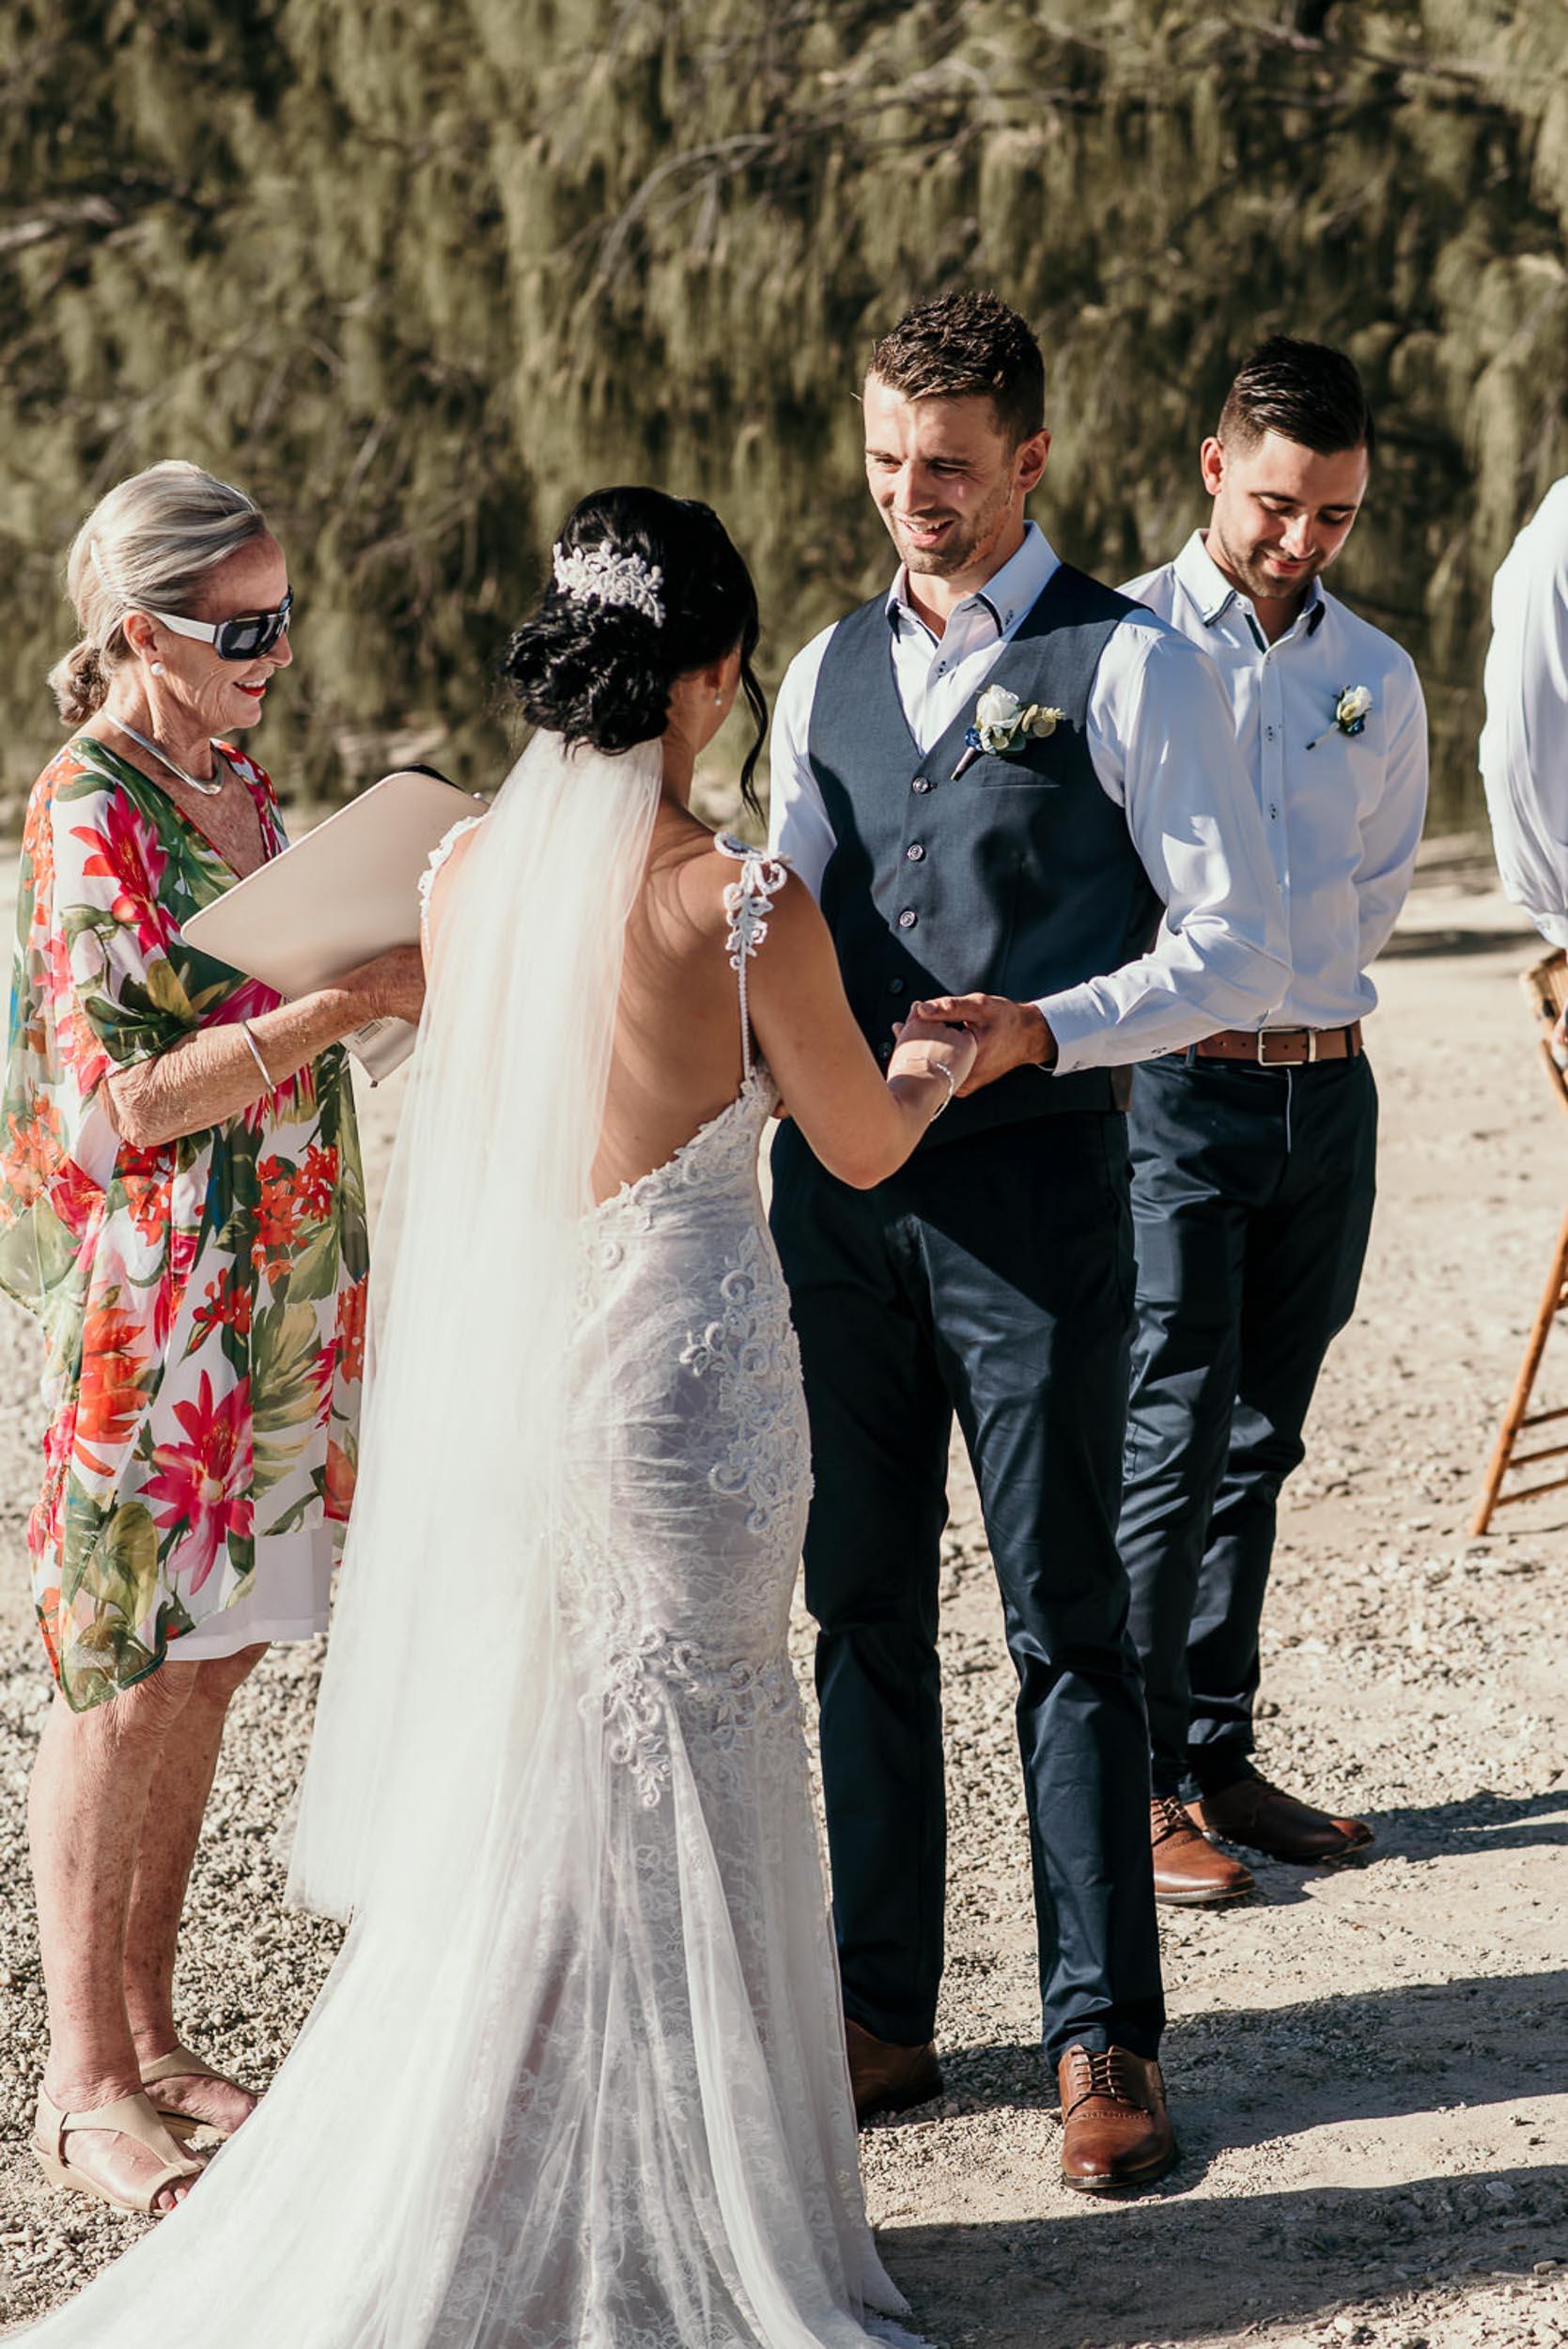 The Raw Photographer - Cairns Wedding Photographer - Fitzroy Island - Destination Wedding - Bride Dress - Groom Portrait - Queensland-22.jpg